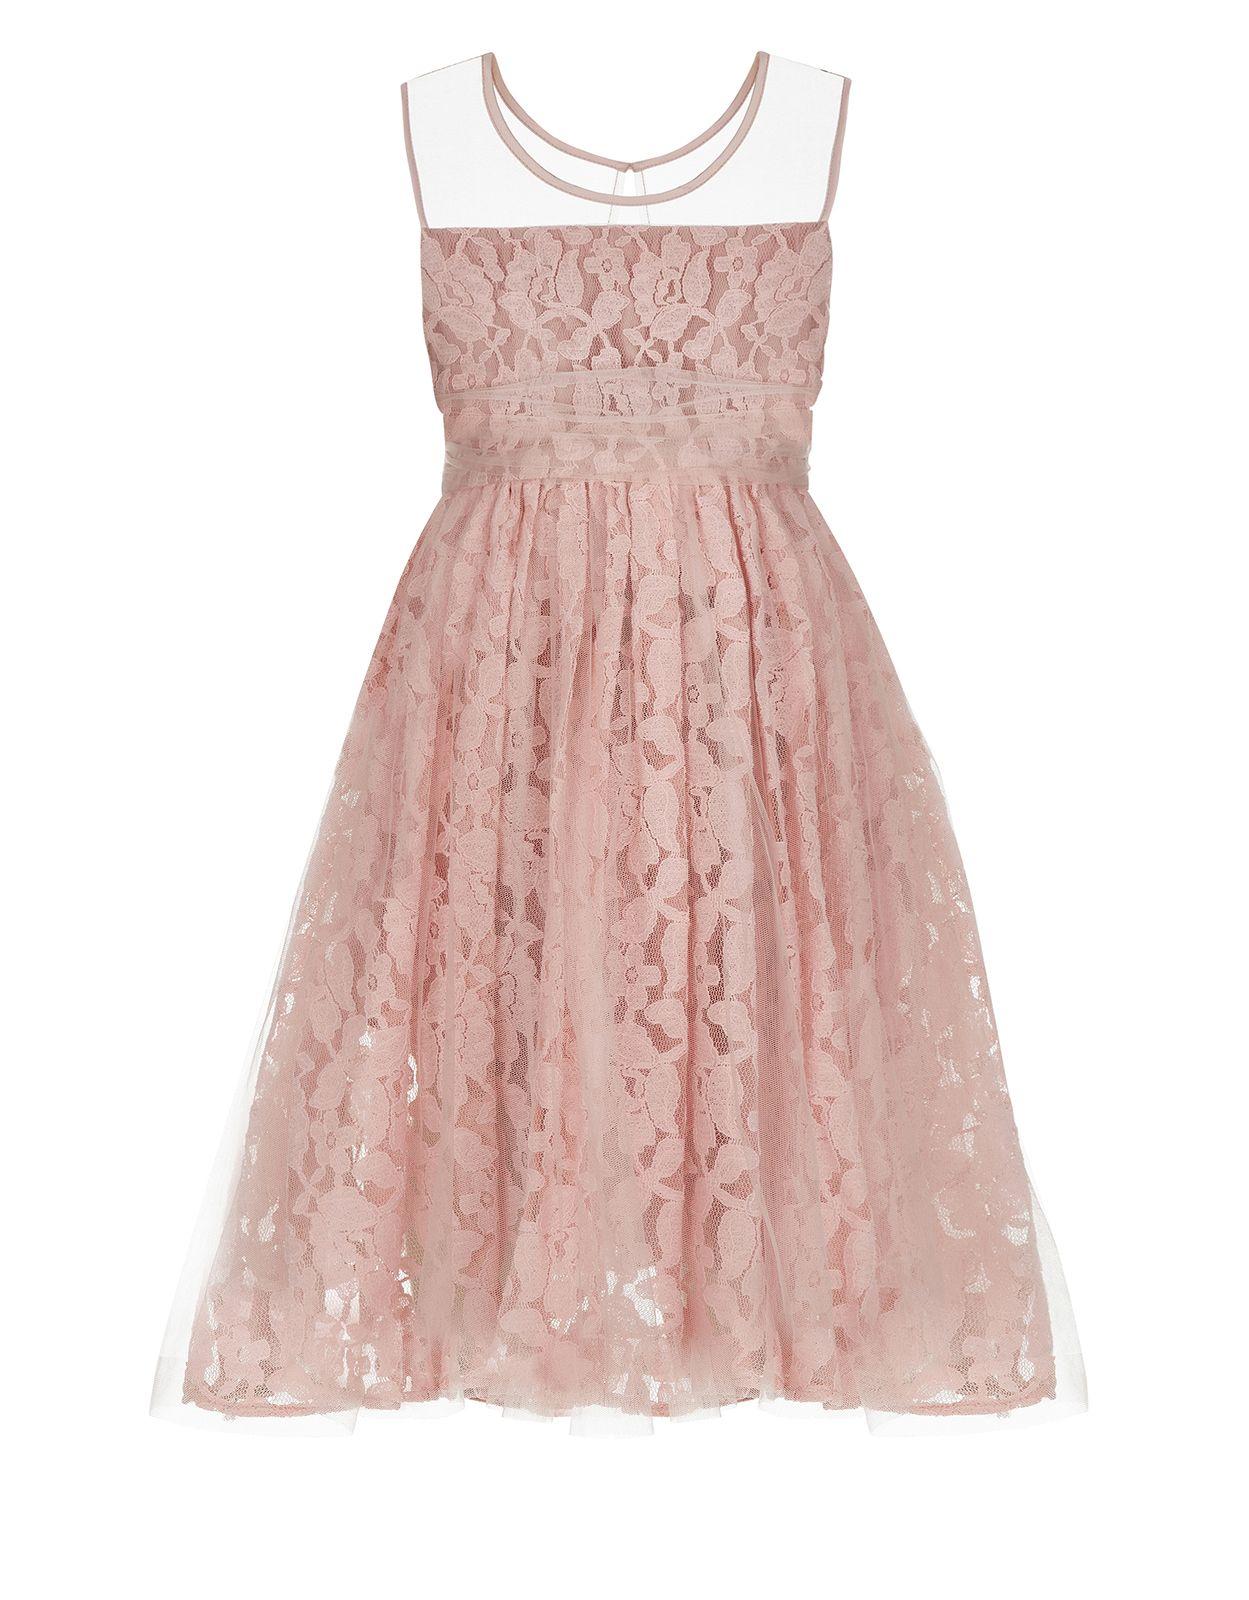 dresses for girls age 12 dresses for girls age 11 12 short